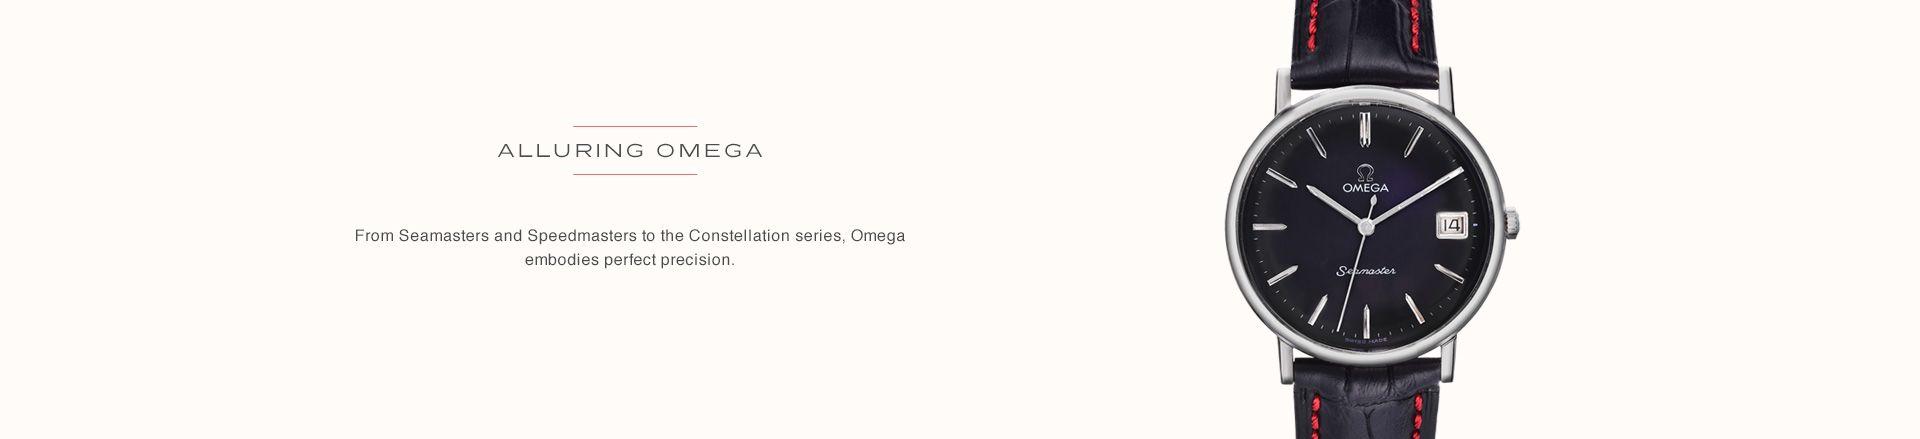 Alluring Omega